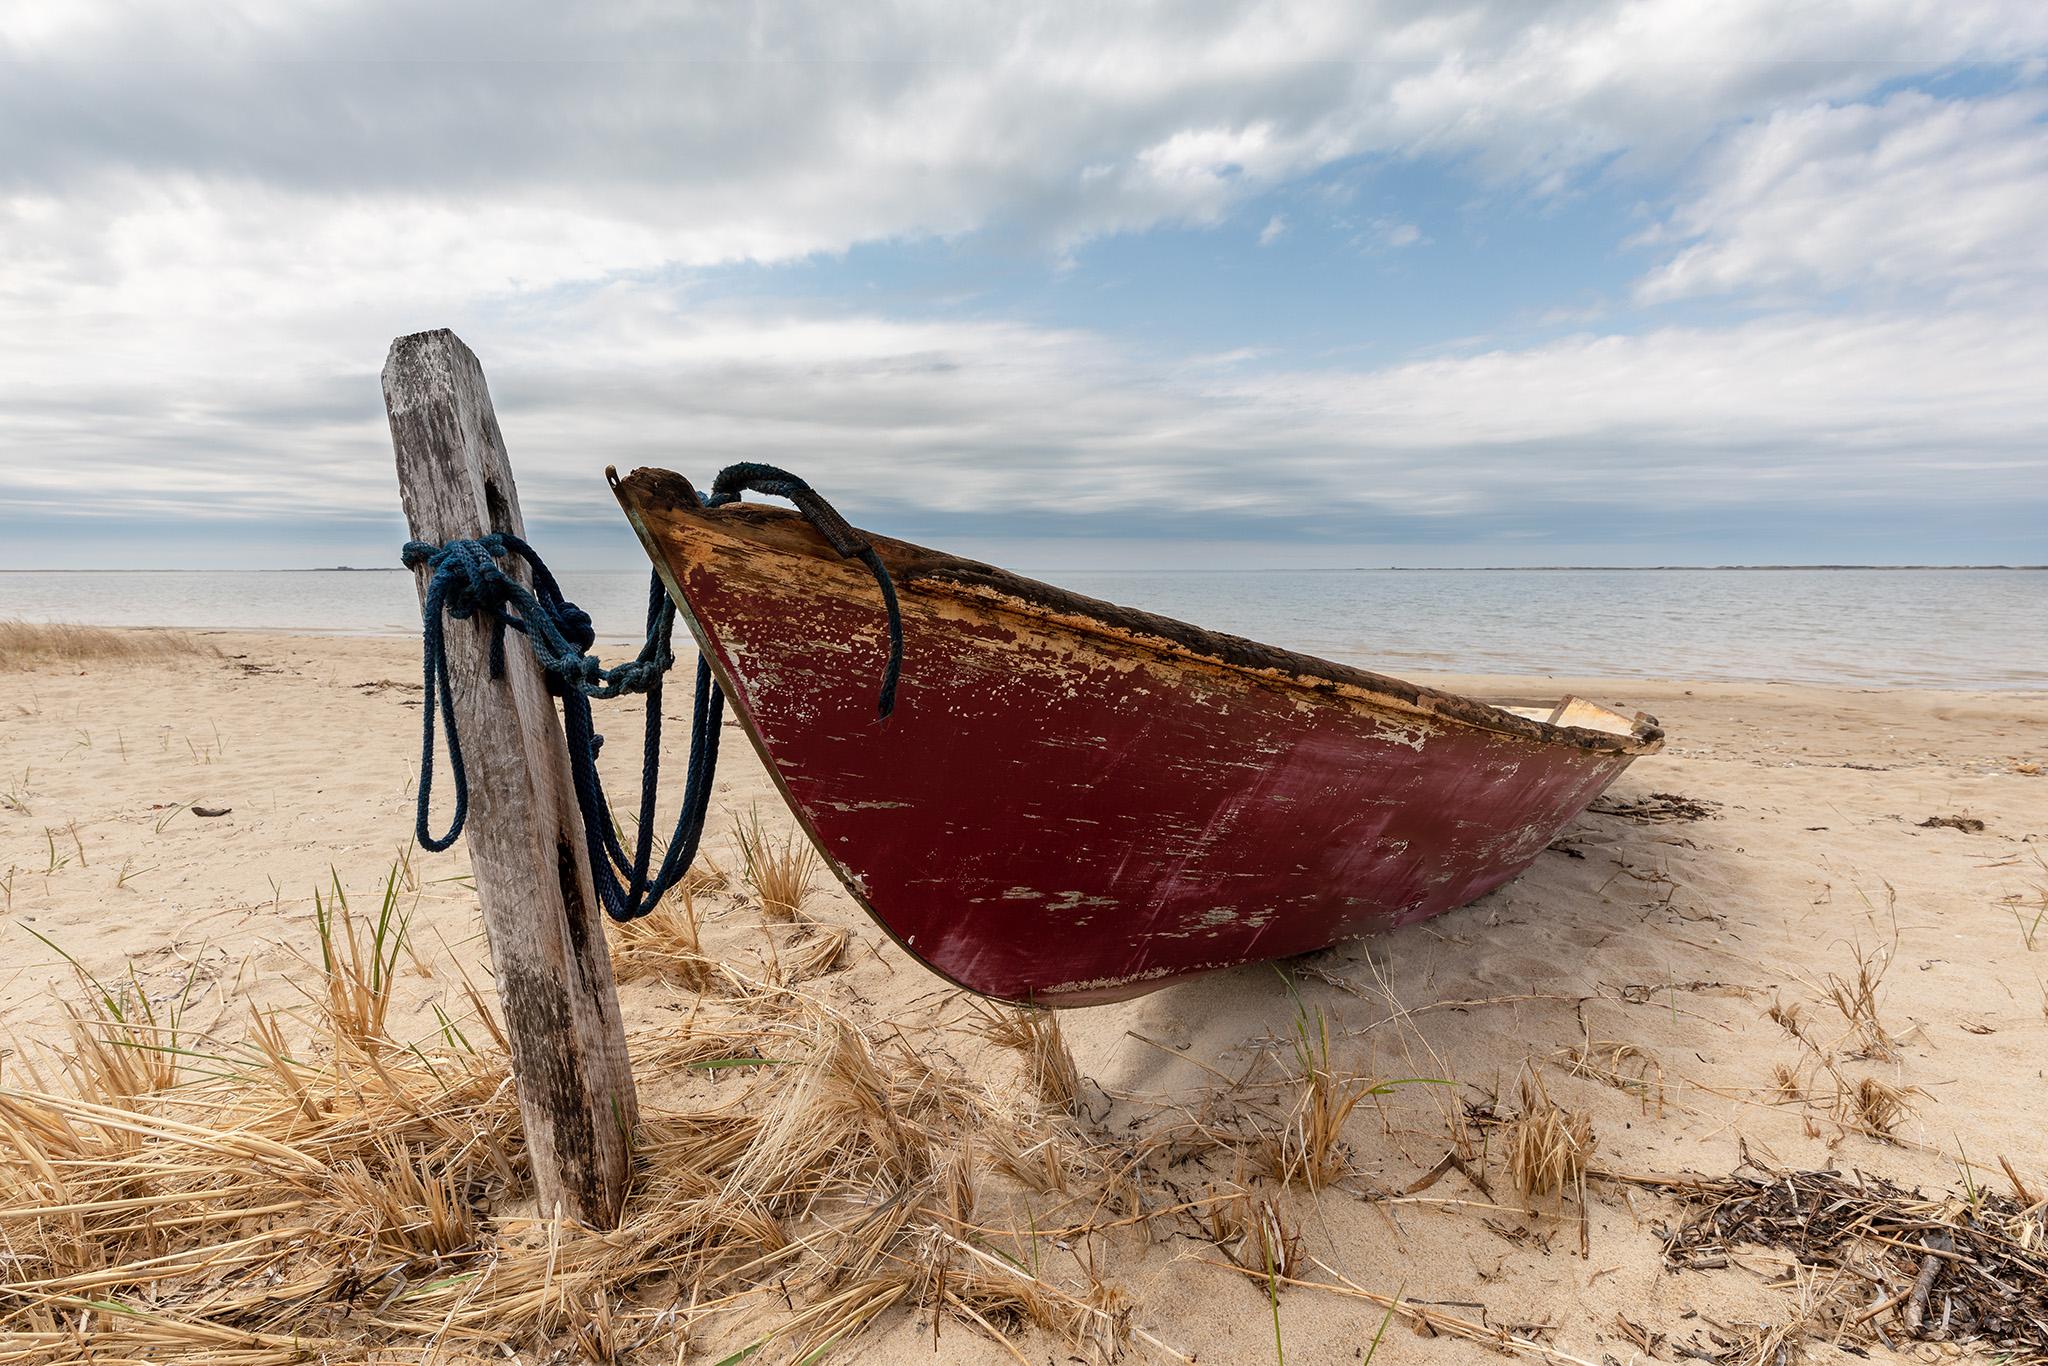 Waiting for High Tide  (c) Shantel Rich